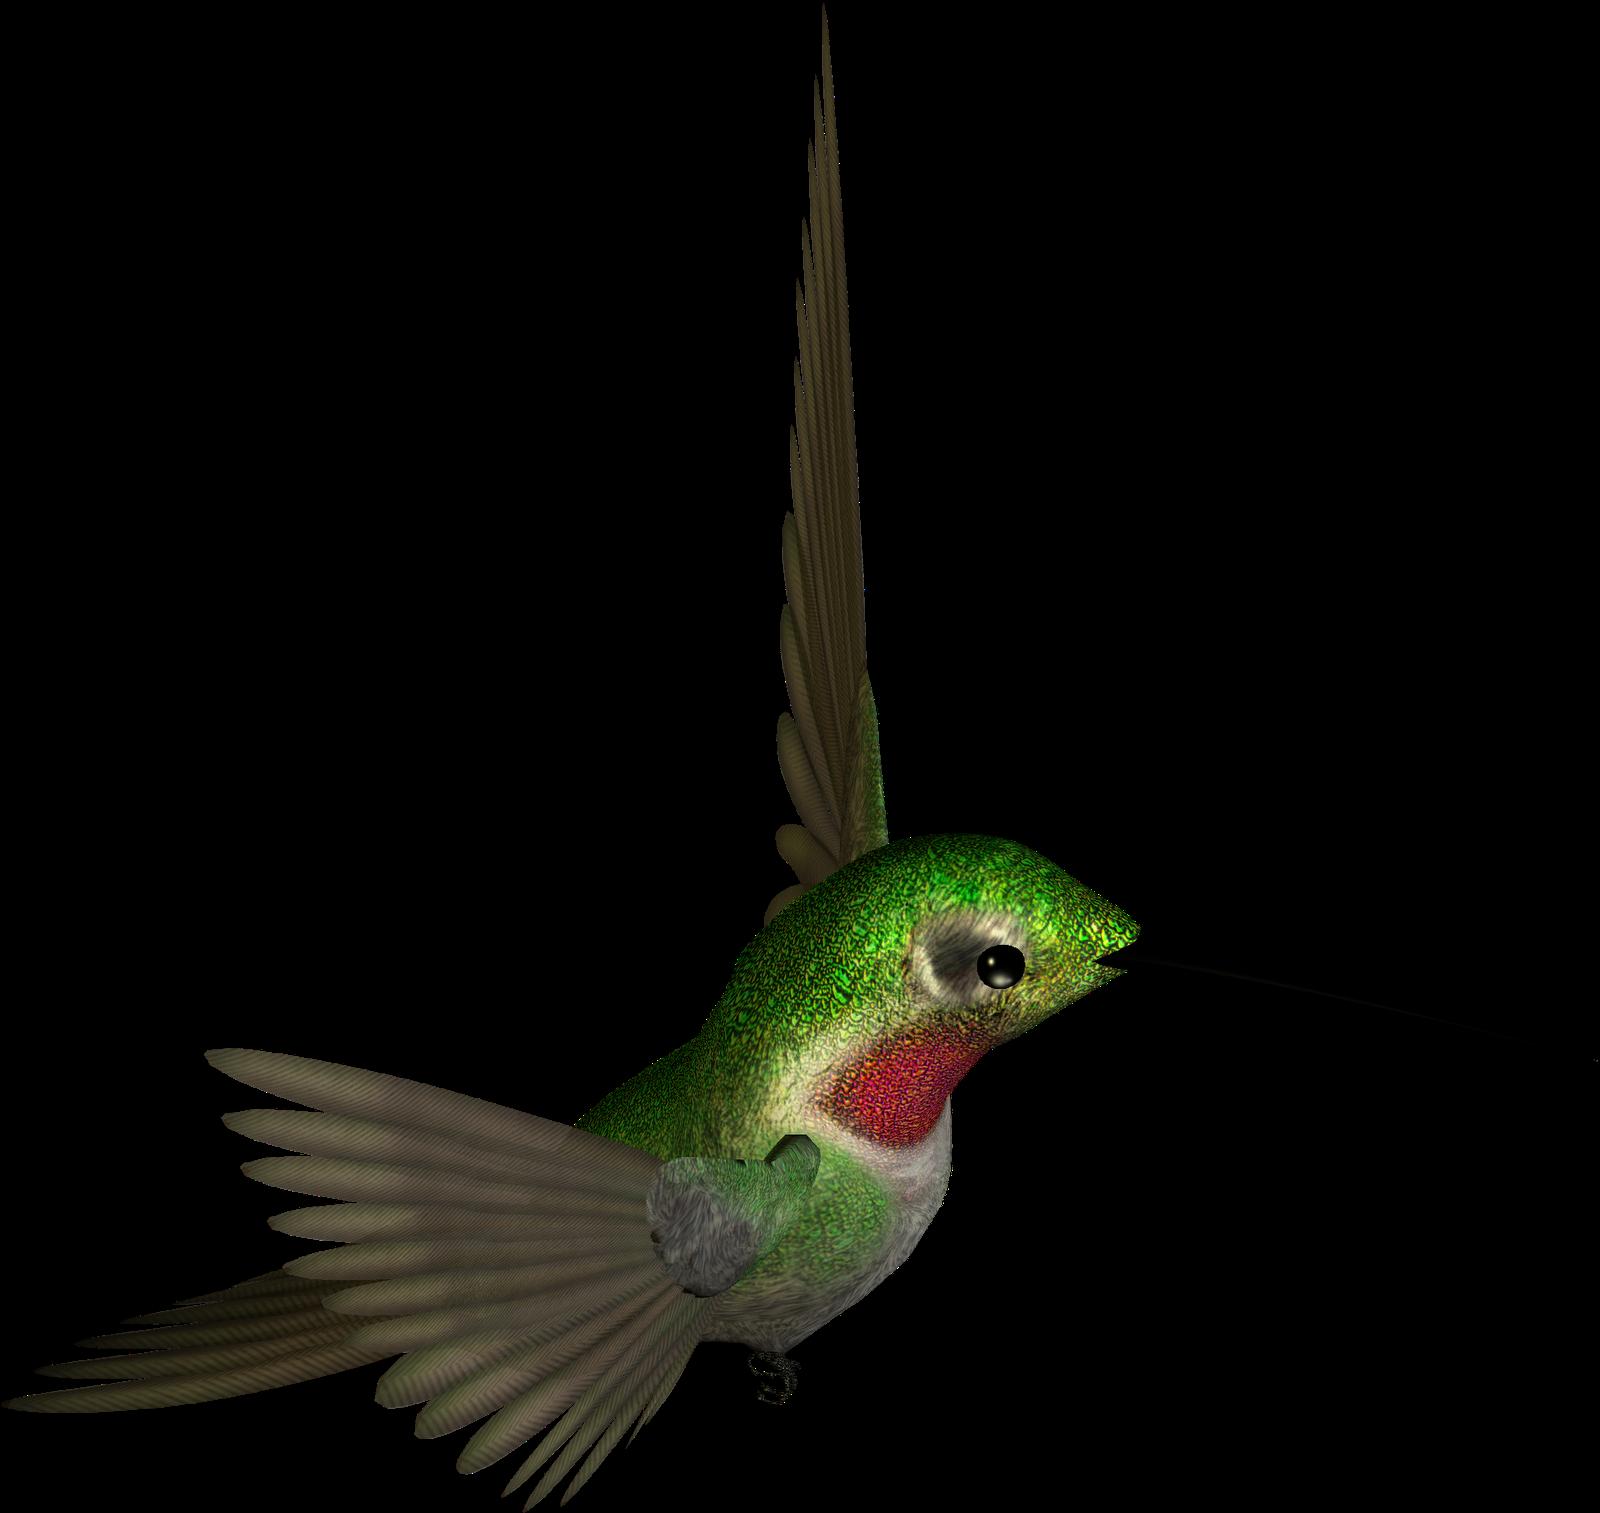 Humming Bird Clipart.